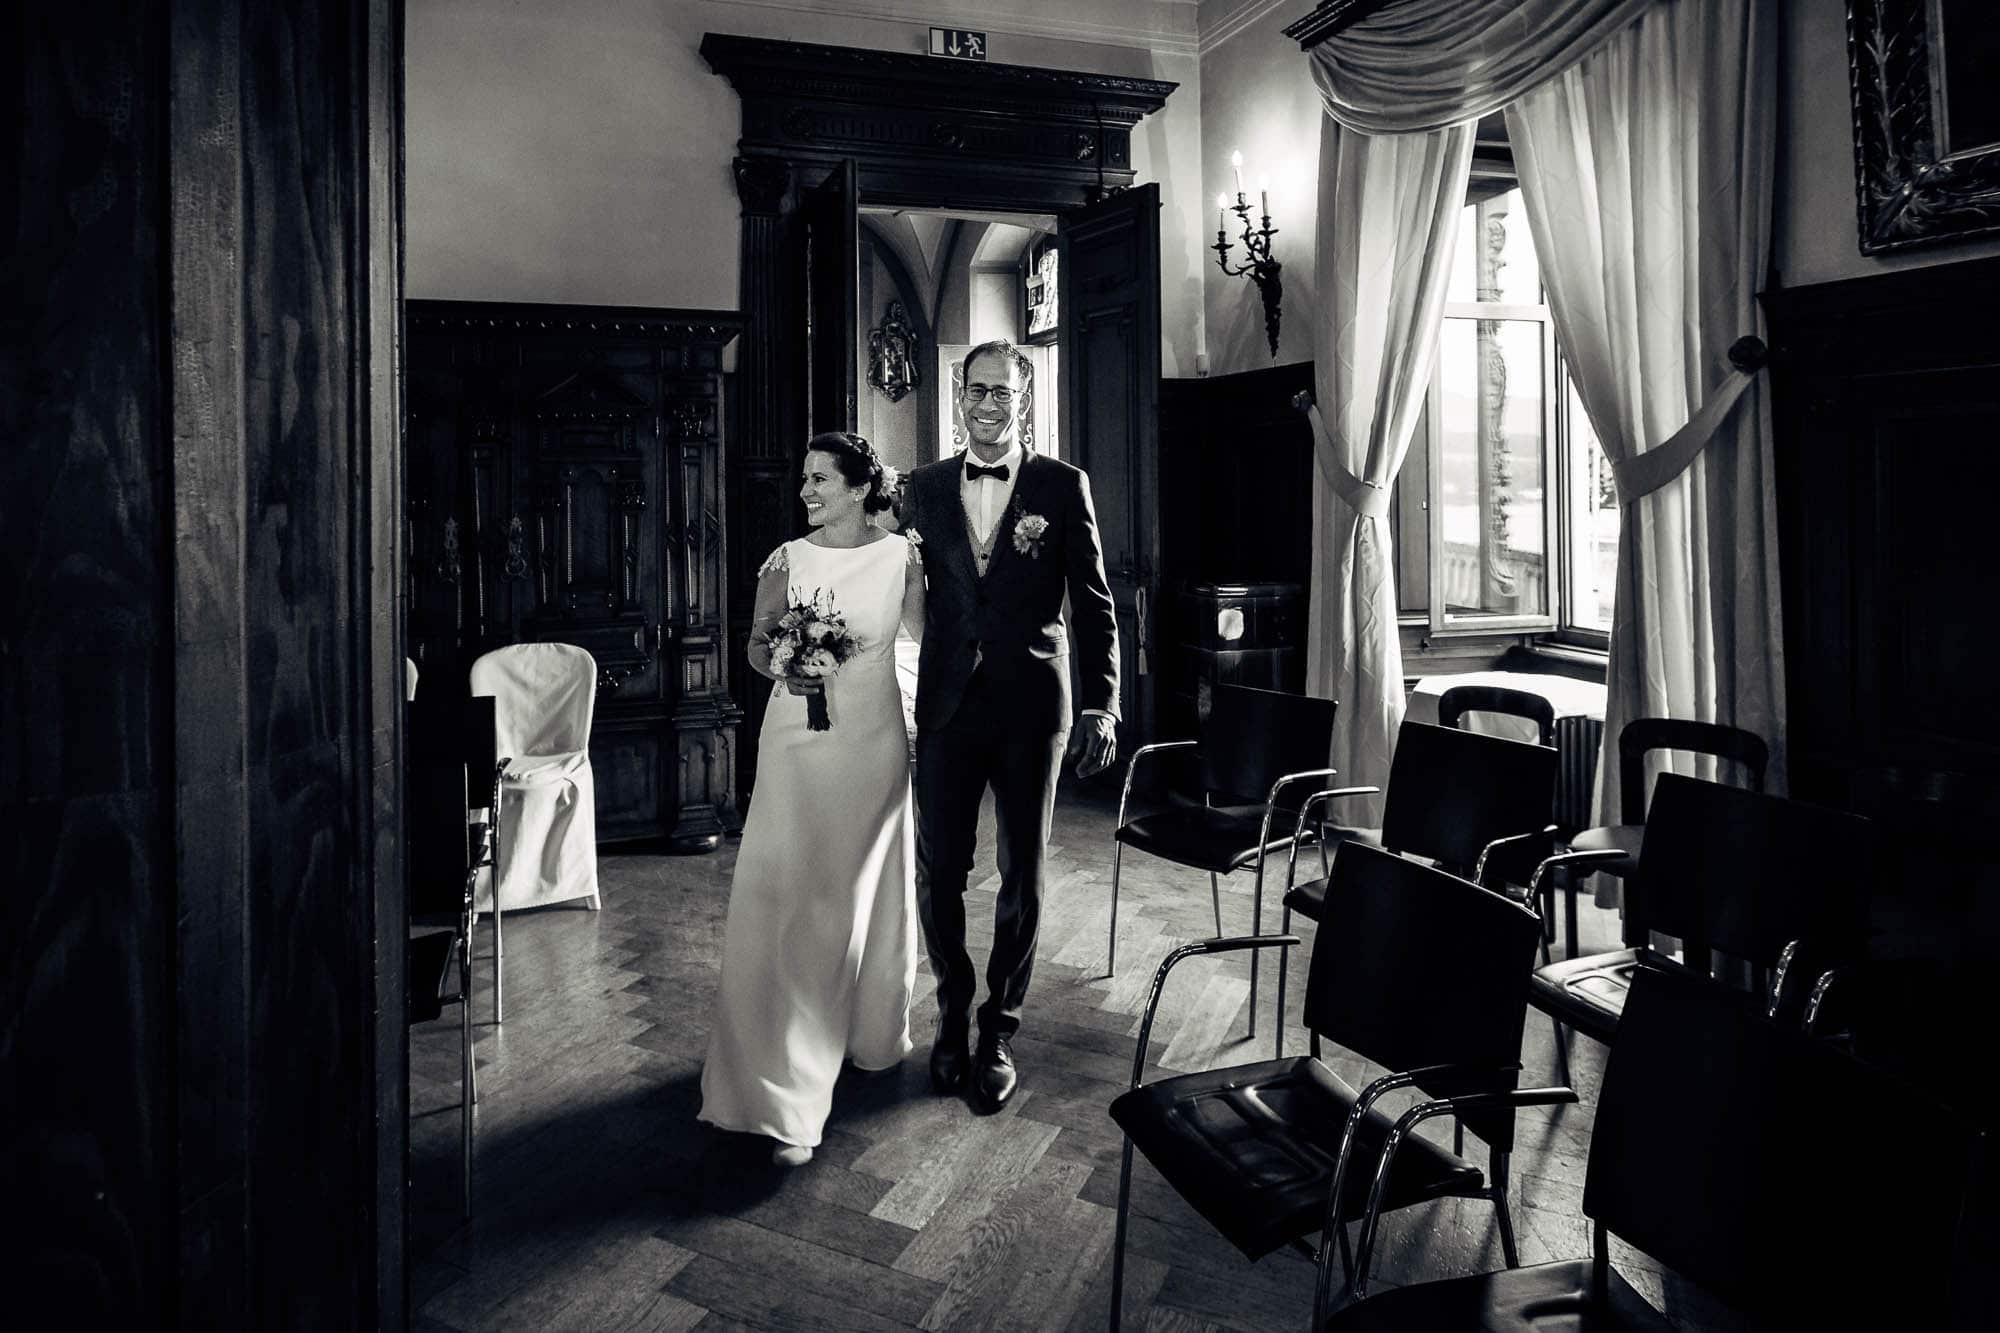 Braut und Bräutigam betreten Saal im Schloss Meggenhorn